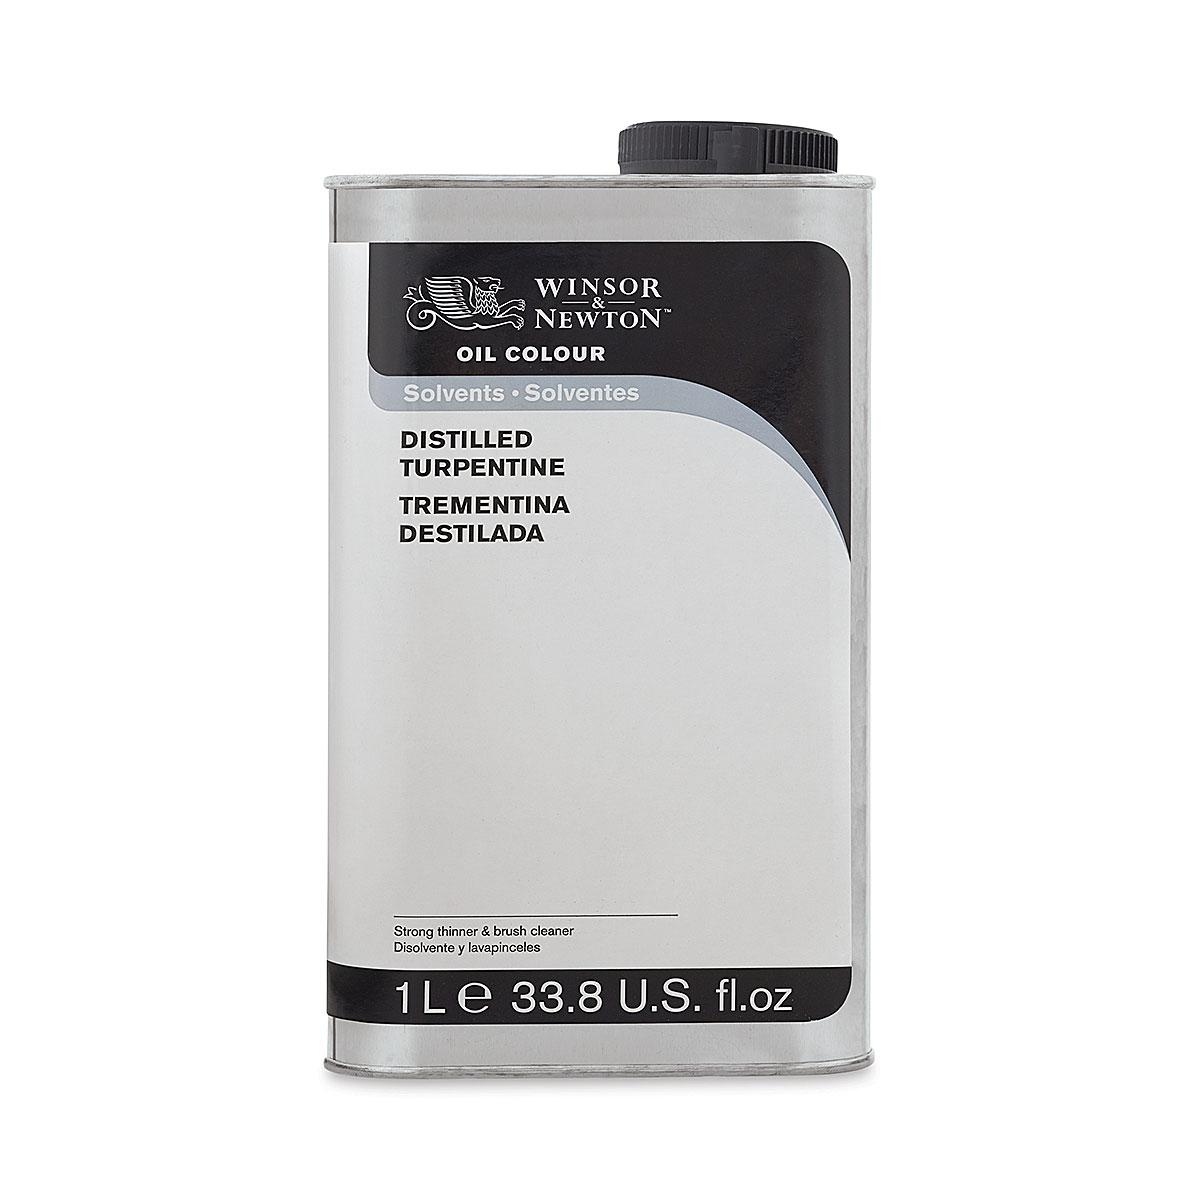 Winsor & Newton Distilled Turpentine - 1 L bottle